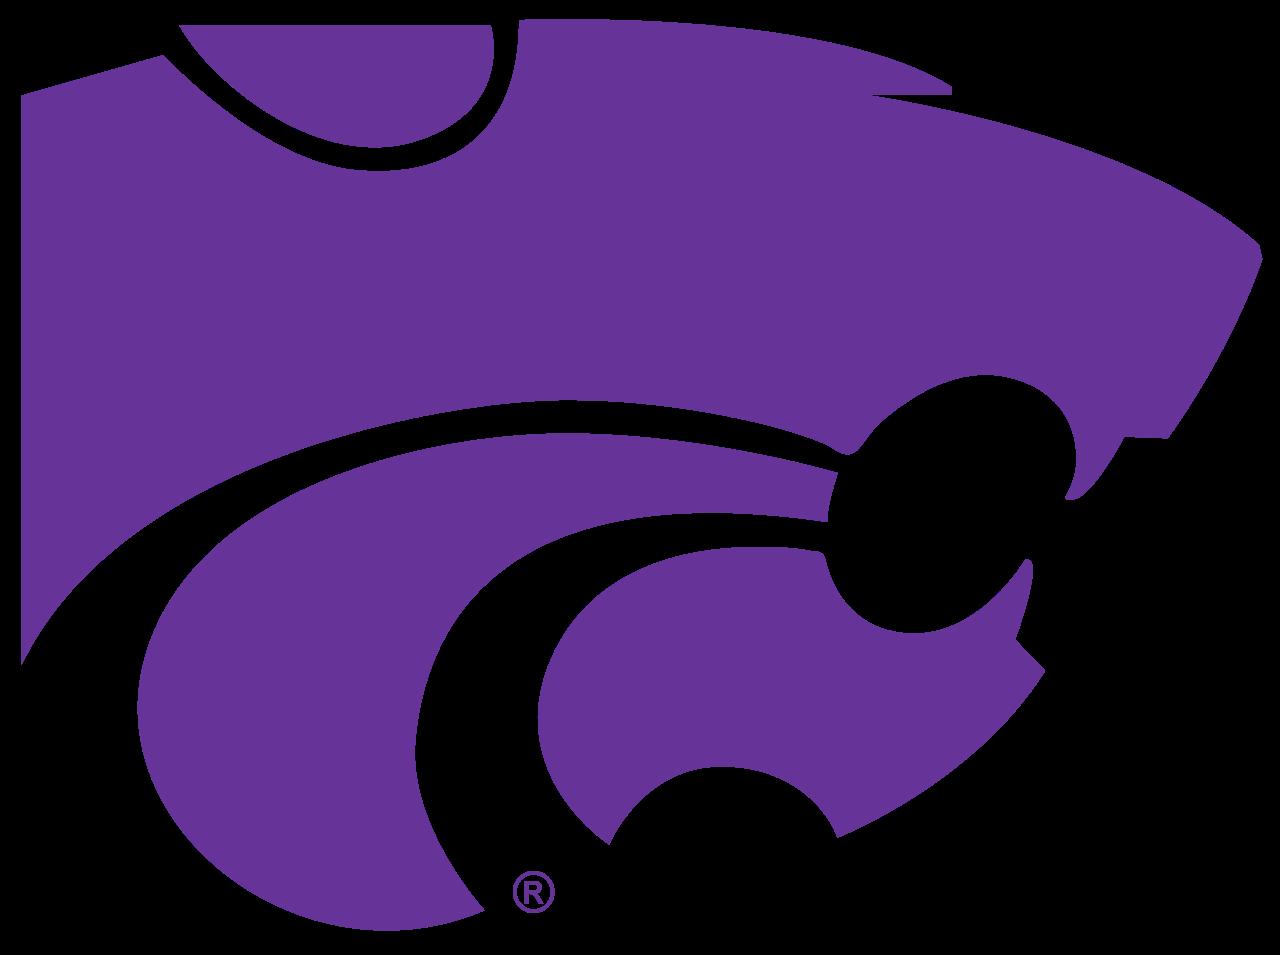 Kansas state university logo clipart clipart stock Kansas state wildcat clipart - ClipartFest clipart stock